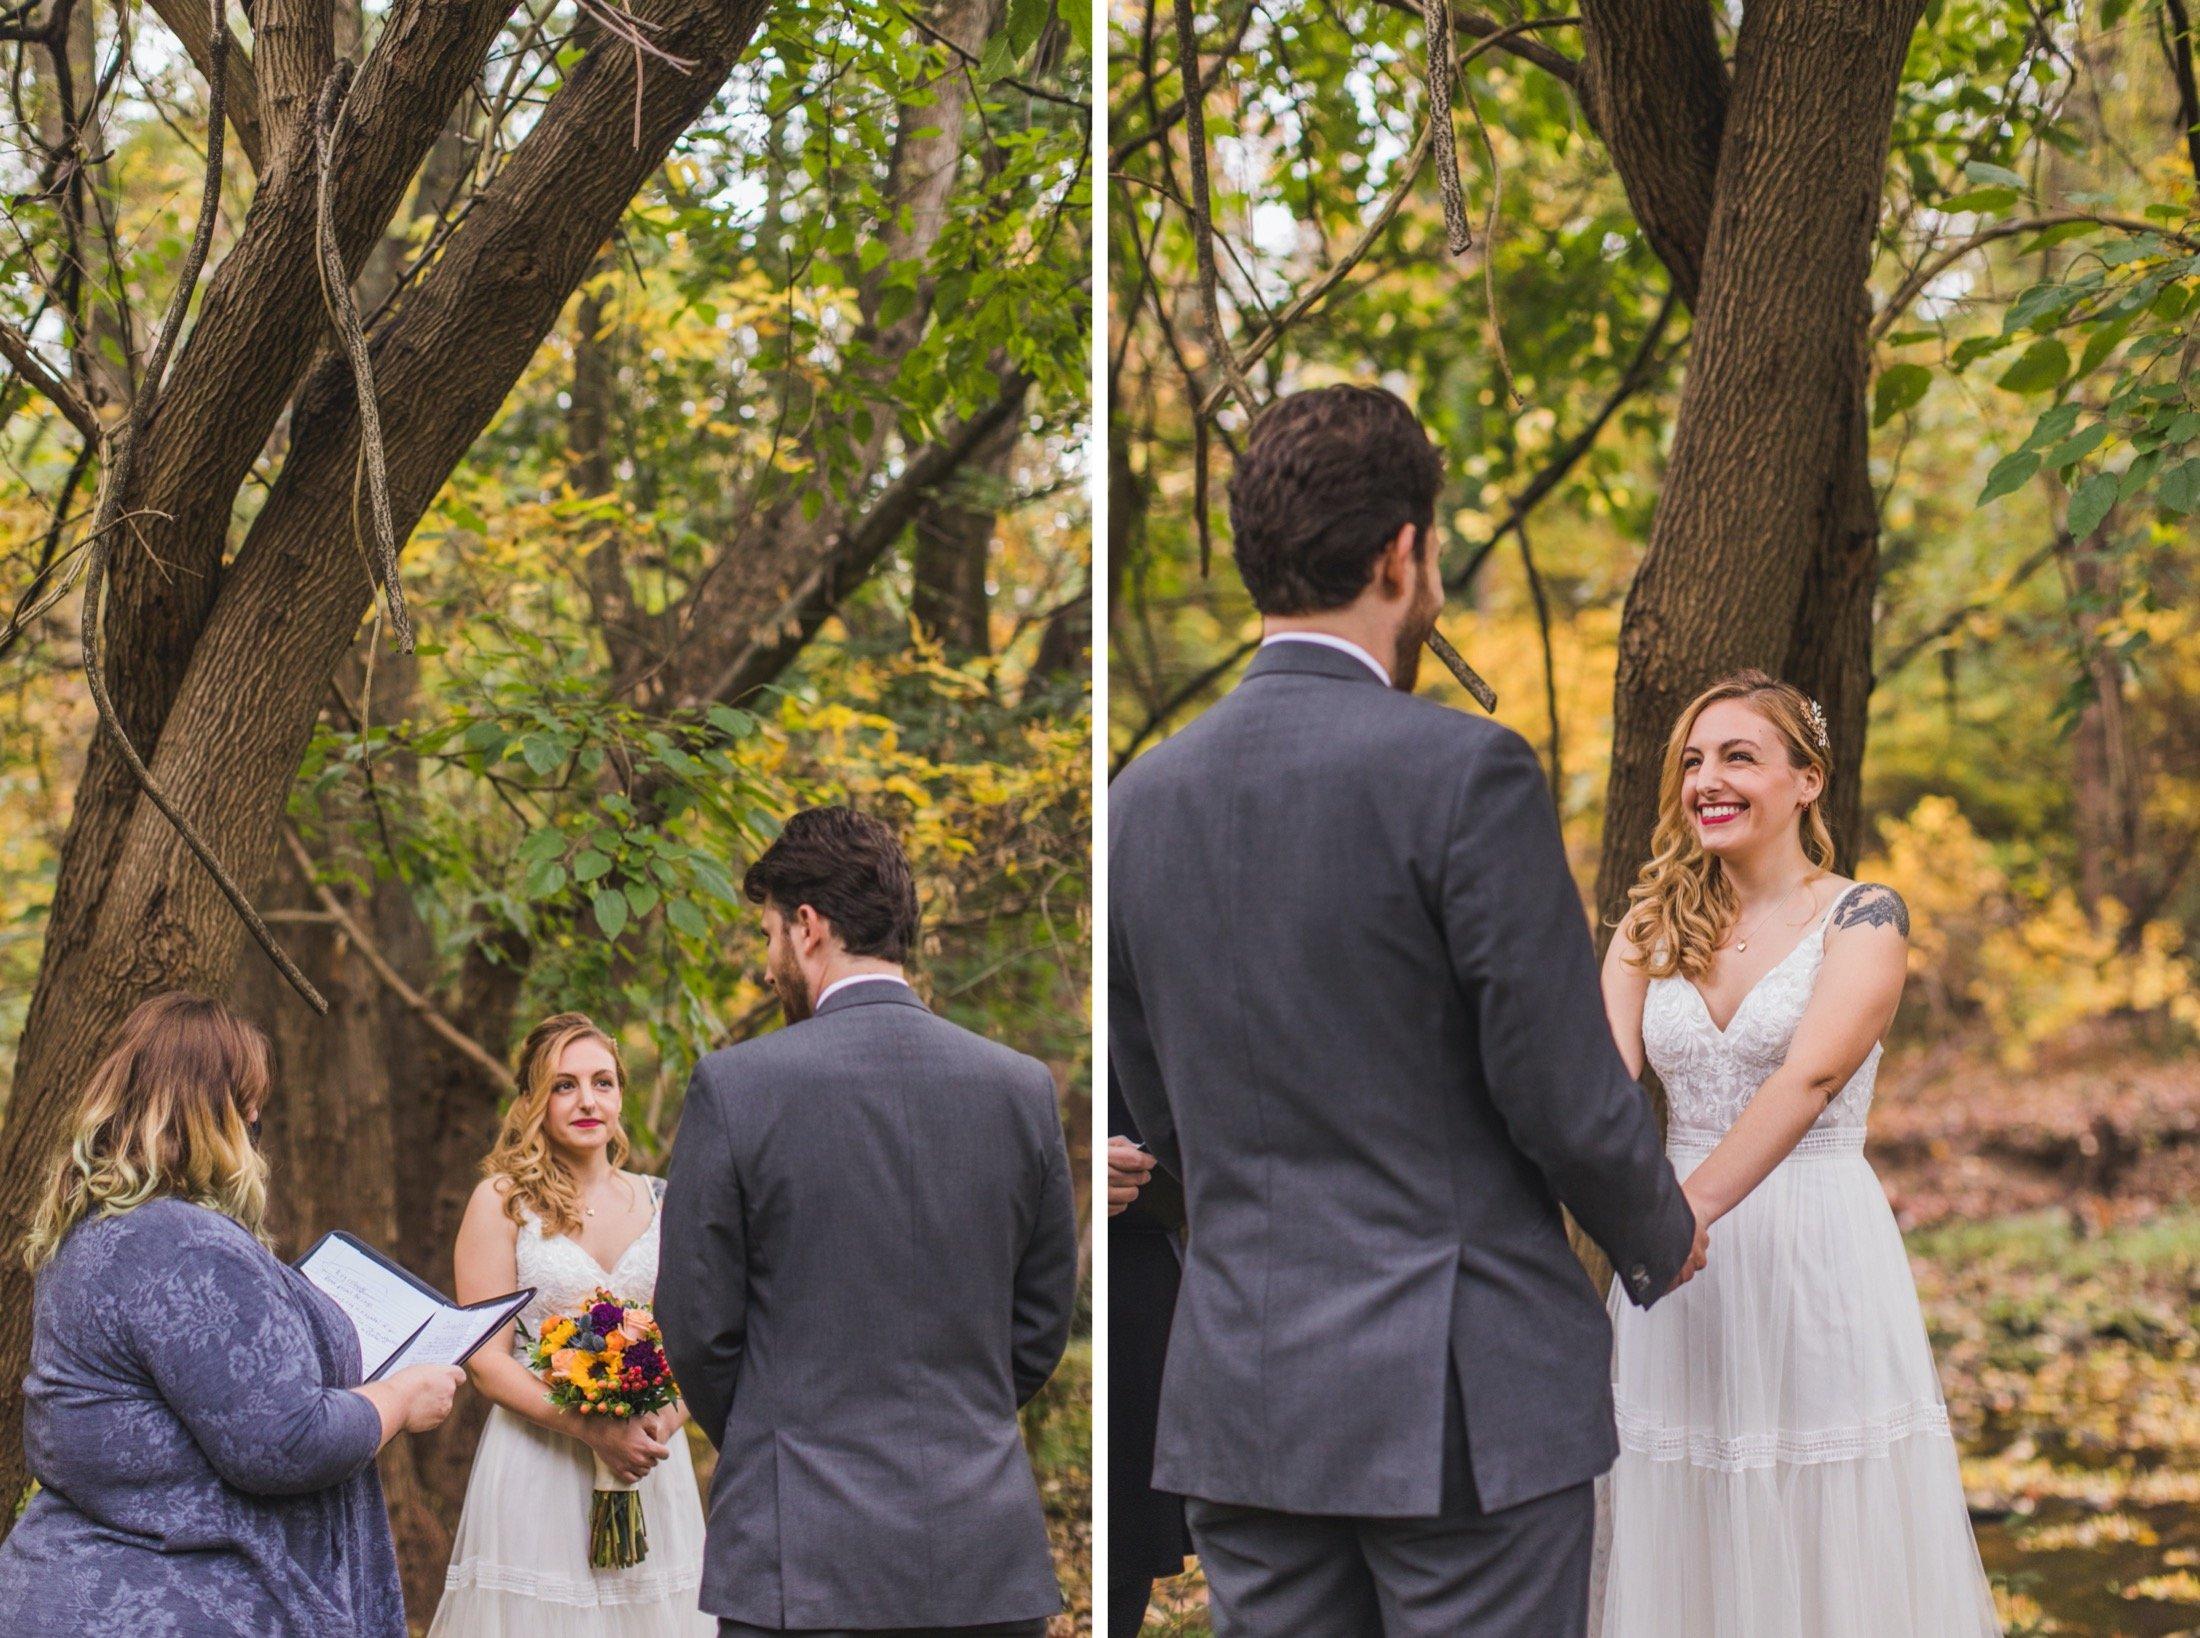 microwedding, ceremony, Curtis Arboretum, Philadelphia